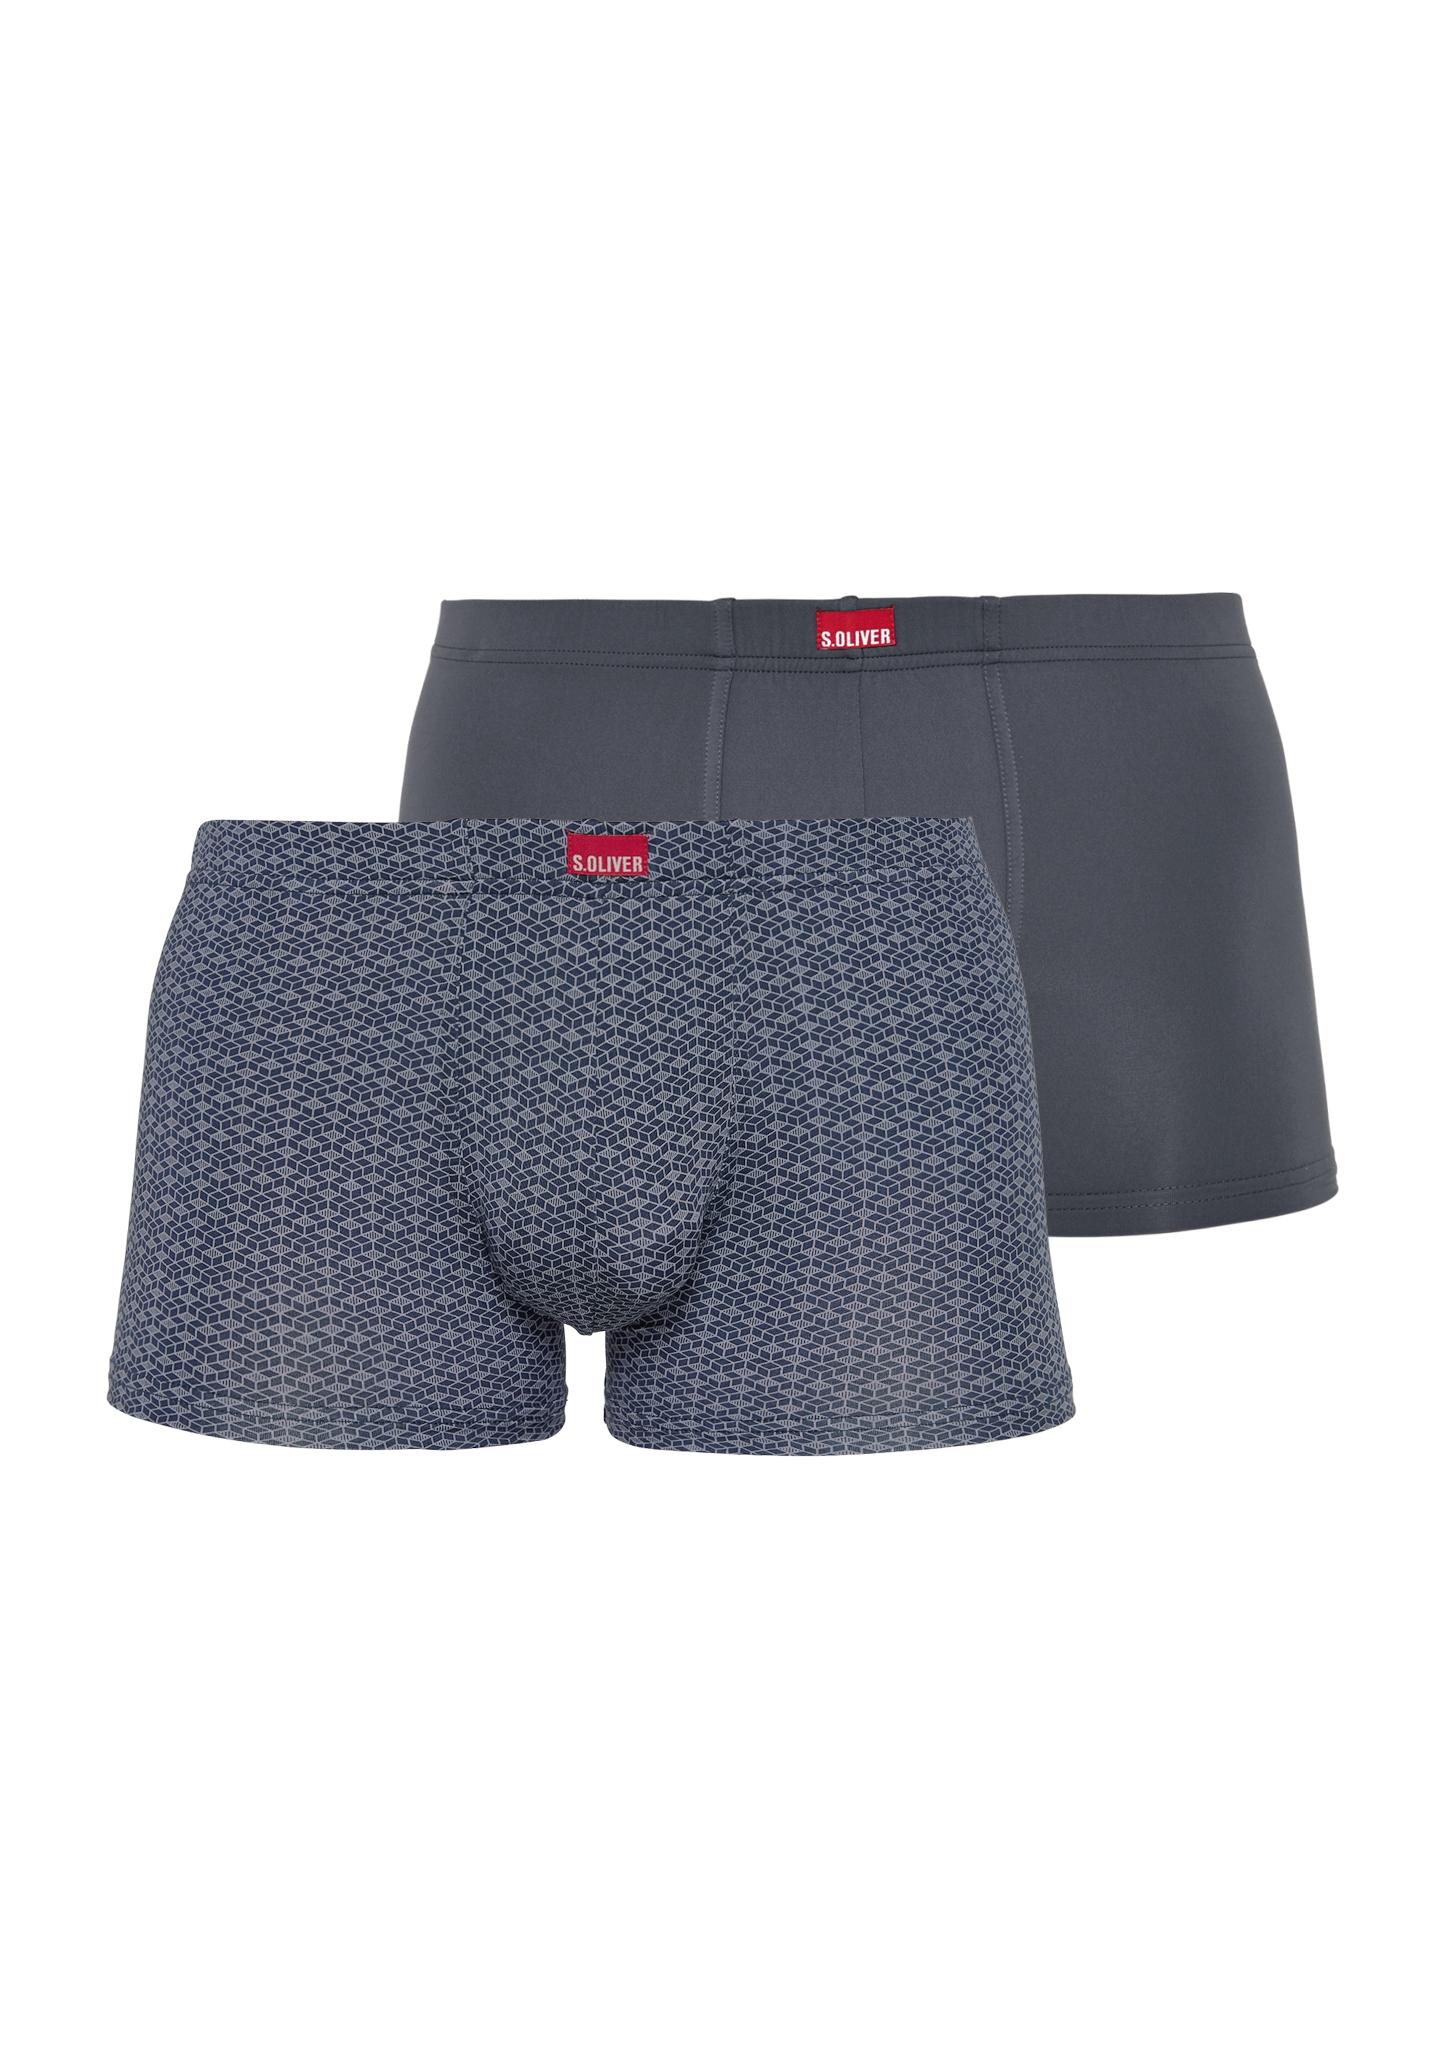 Boxershorts | Bekleidung > Wäsche > Boxershorts | Blau | 45% polyamid -  45% polyester -  10% elasthan | s.Oliver